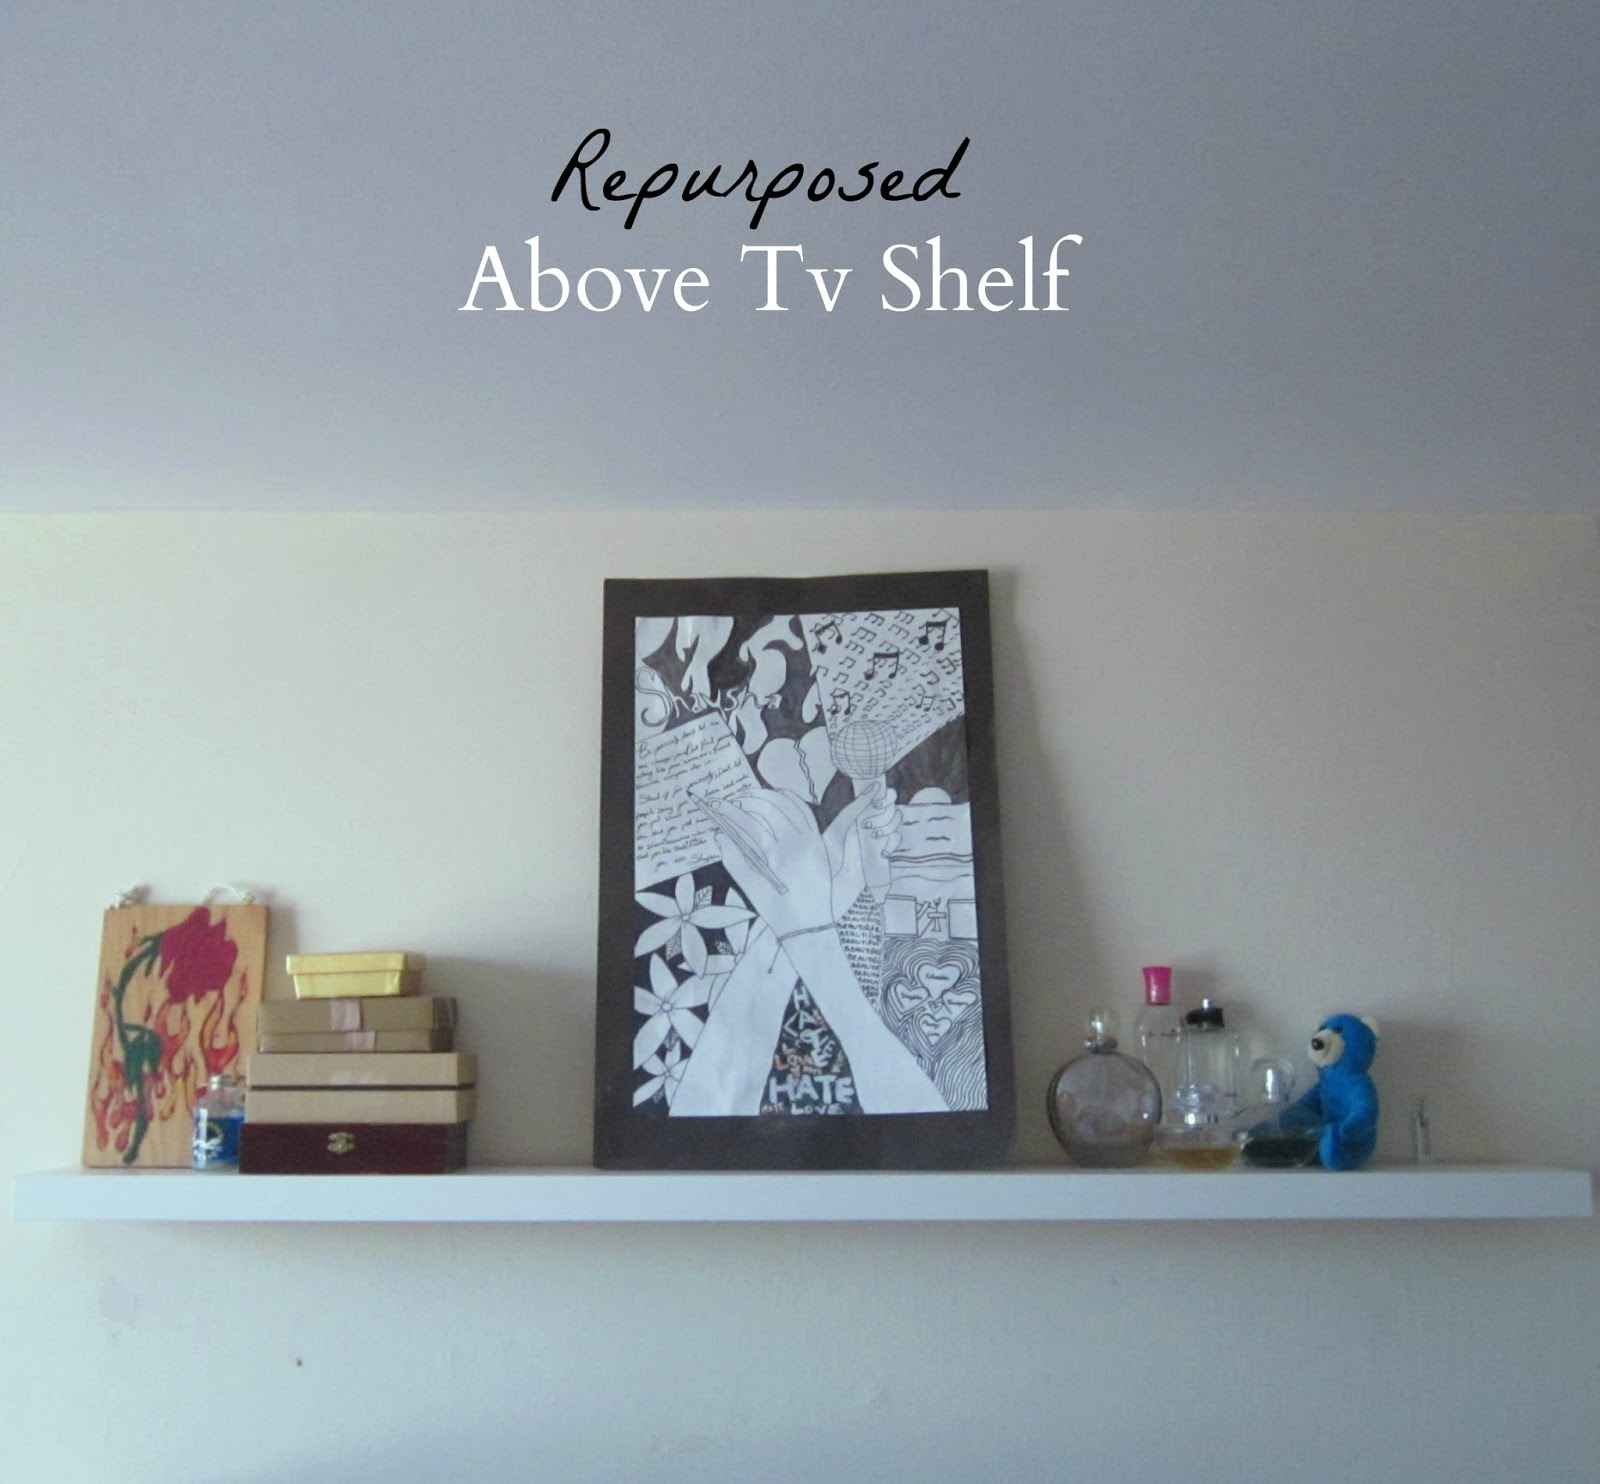 Repurposed Above Tv Shelf